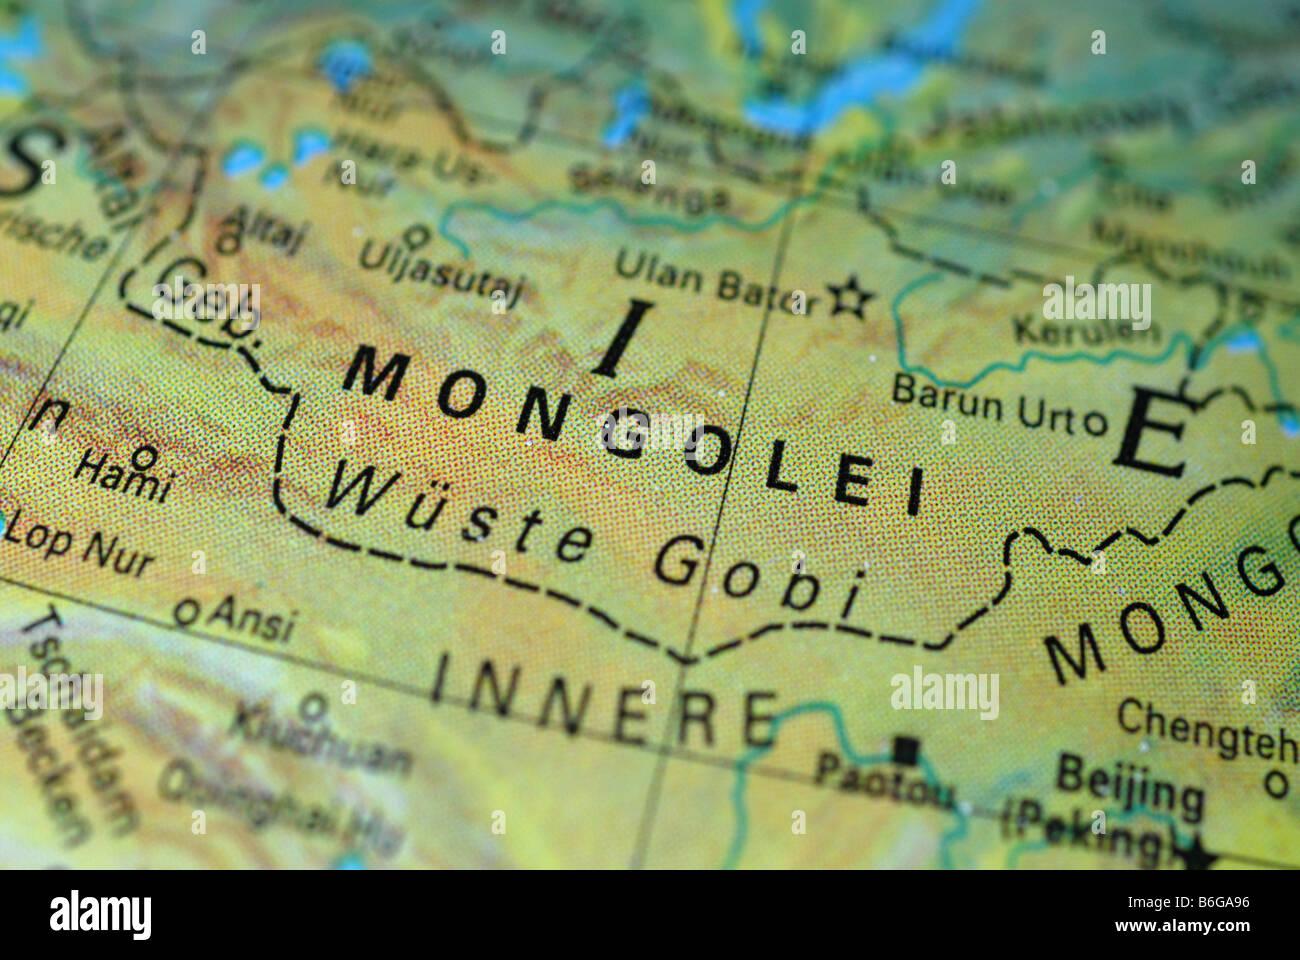 Mongolia - Stock Image